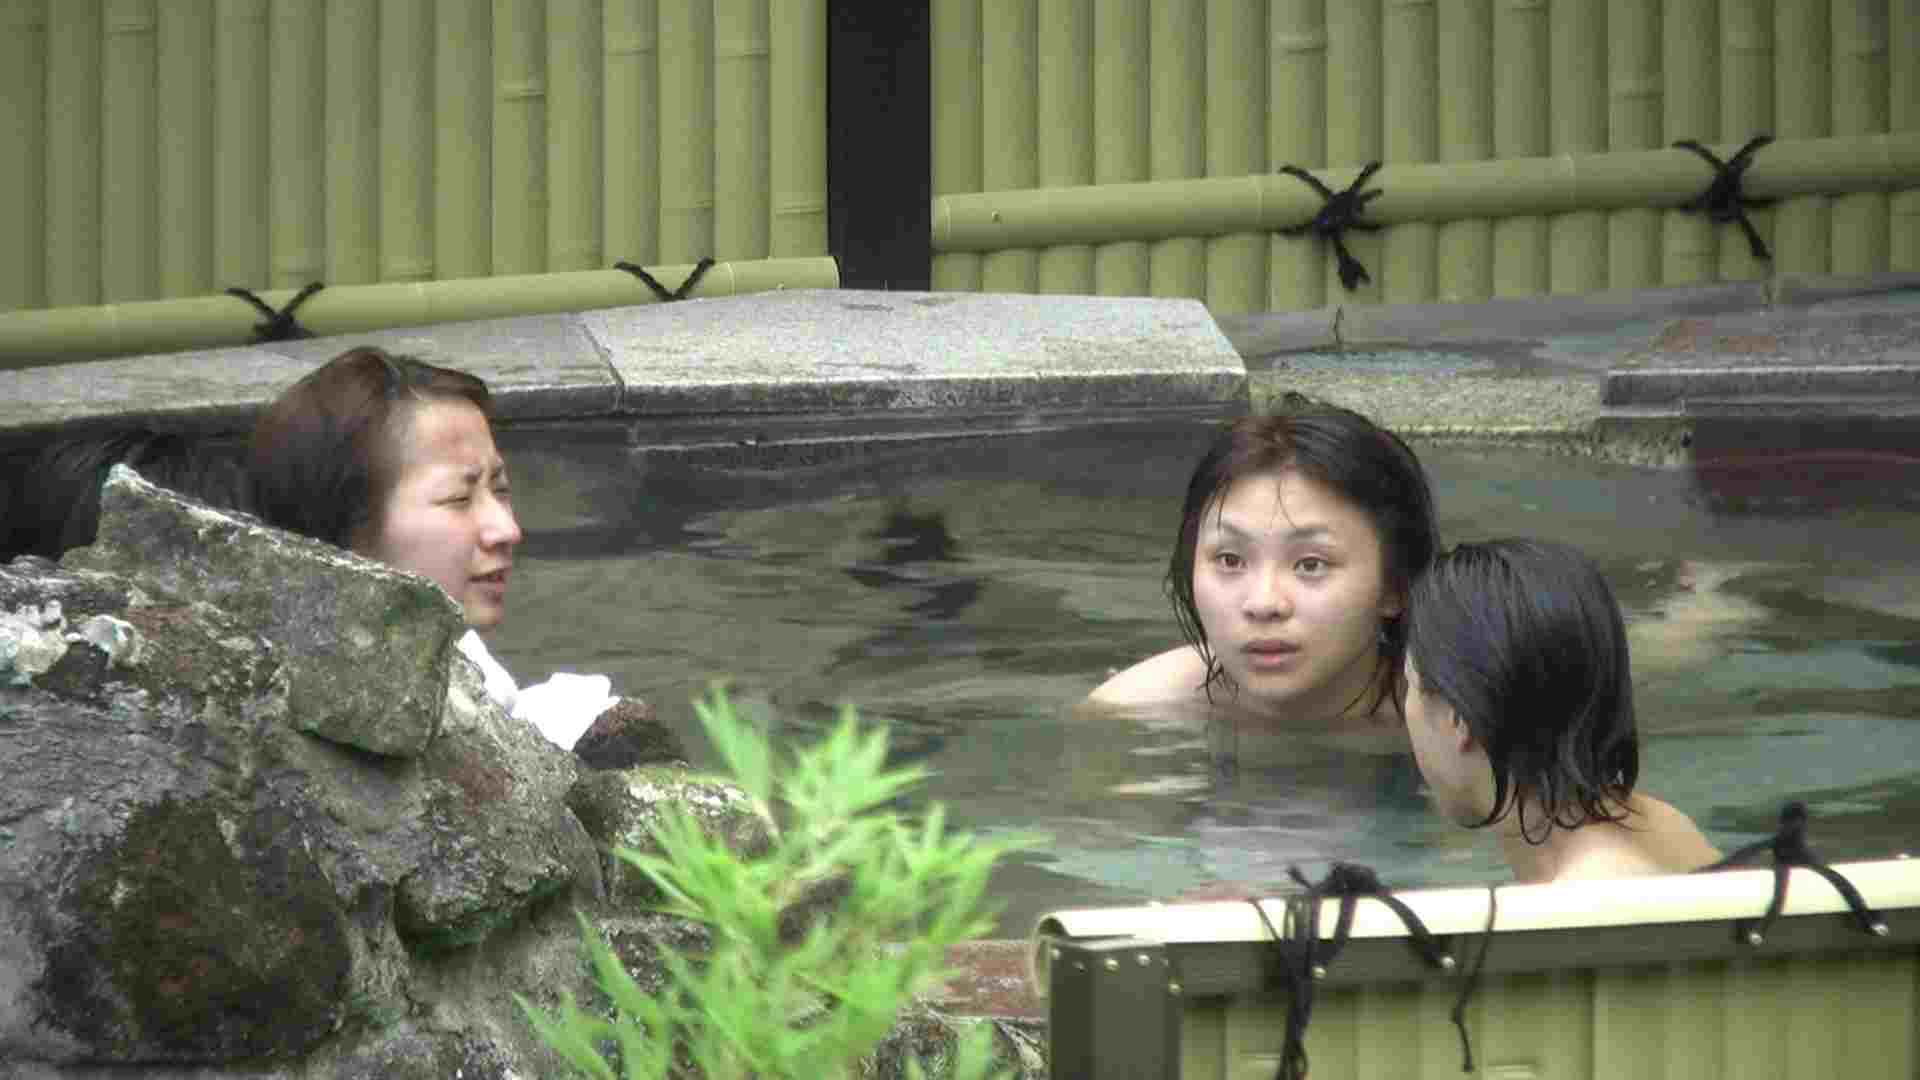 Aquaな露天風呂Vol.181 OLのエロ生活 | 露天風呂  40連発 19